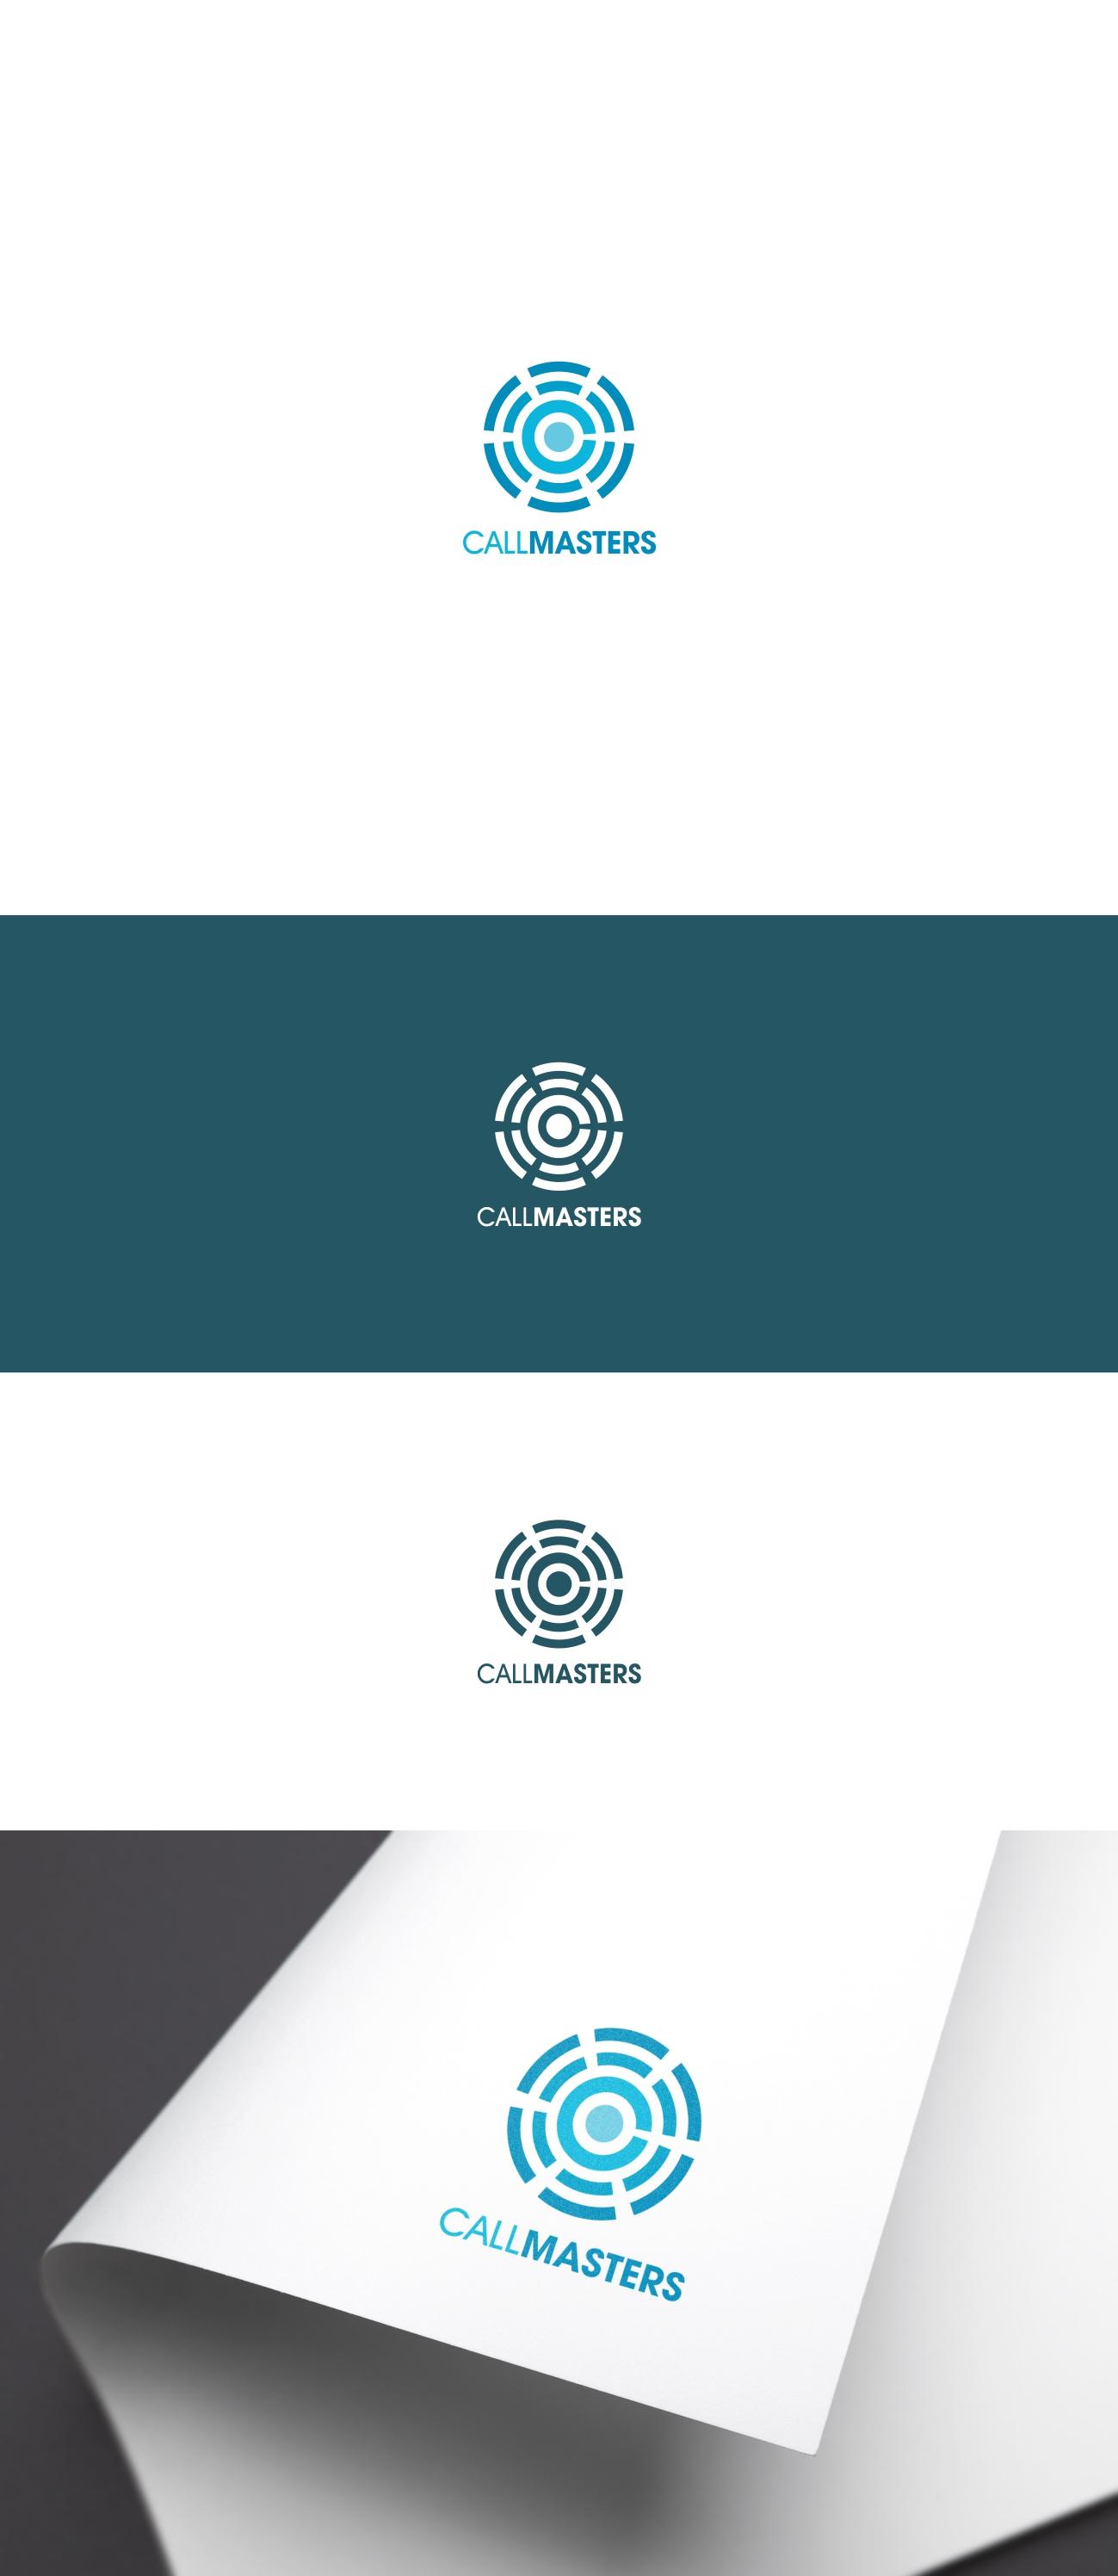 Логотип call-центра Callmasters  фото f_5625b6add9b8f7bf.jpg